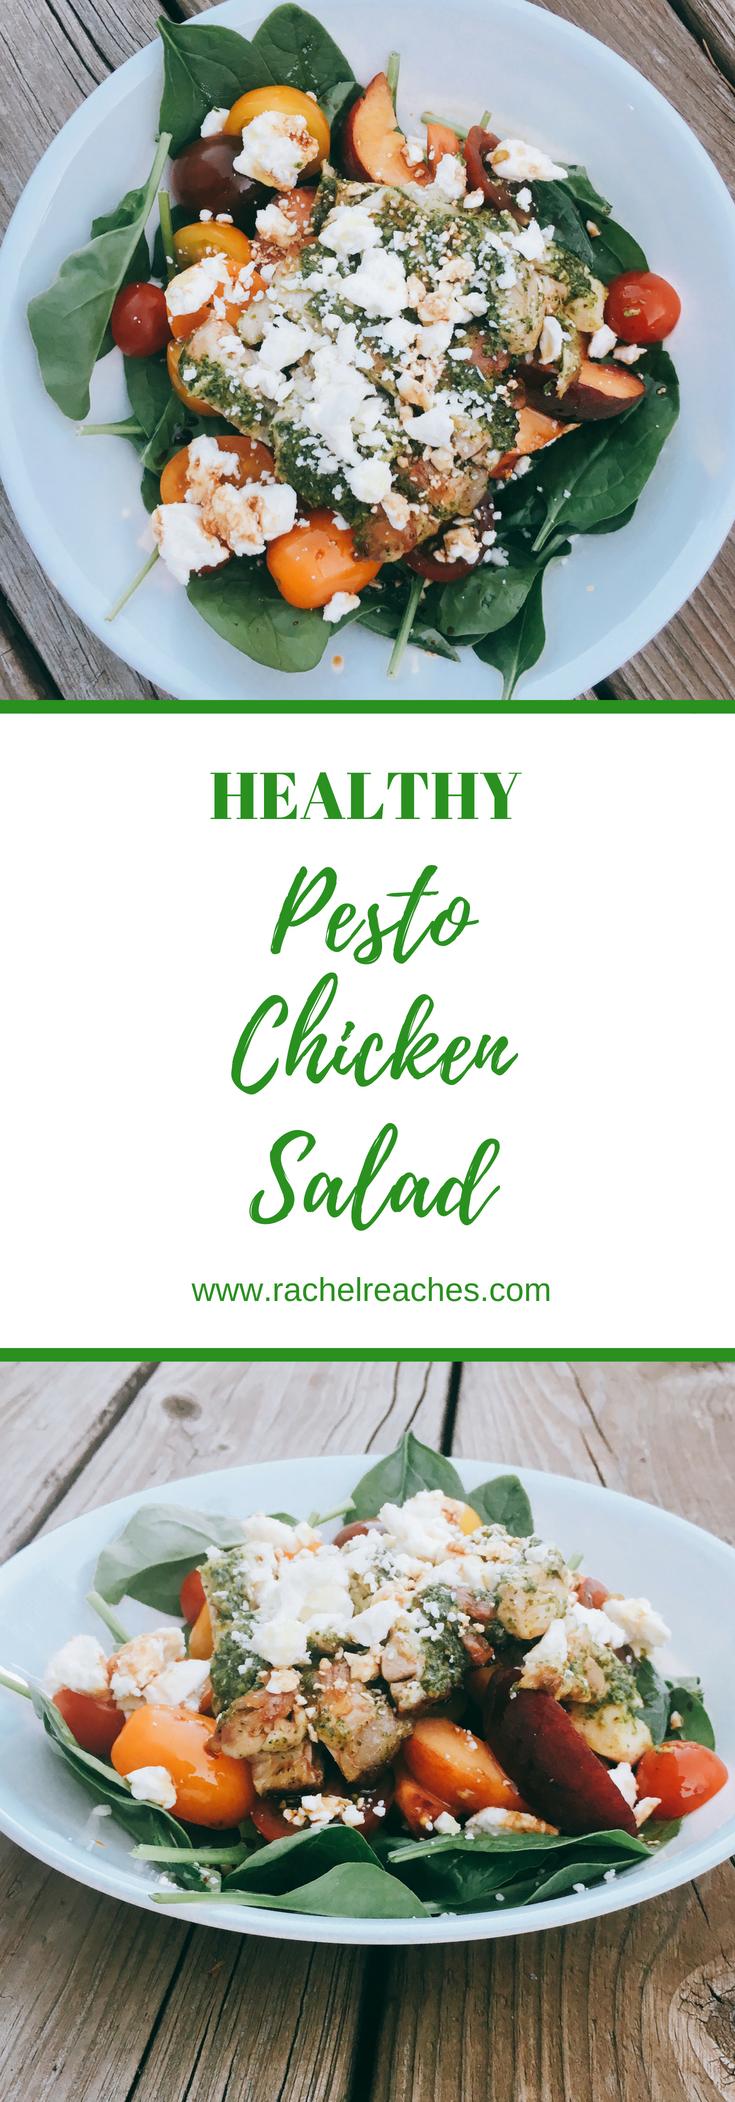 Pesto Chicken Pinterest Pin - Healthy Recipes.png